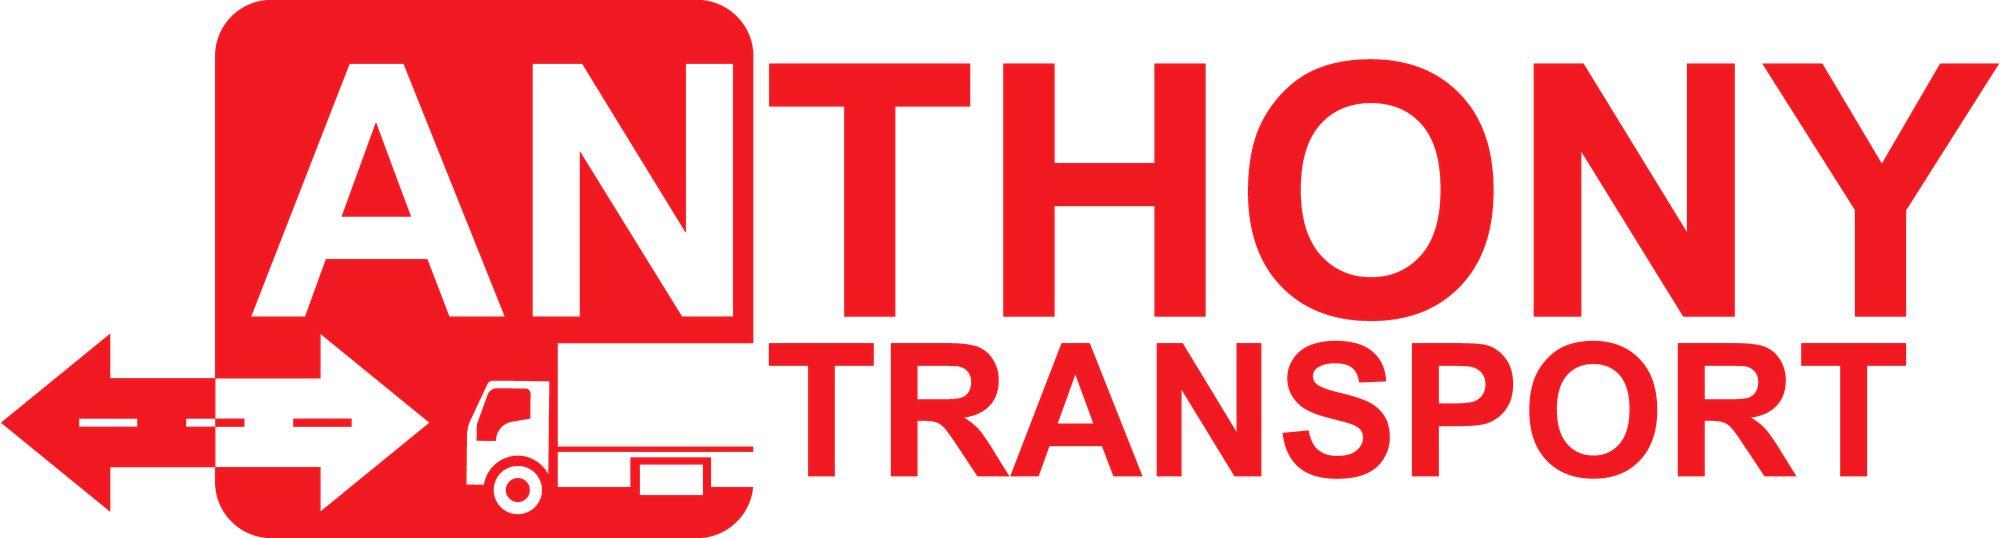 ANTHONY TRANSPORT s.r.o.